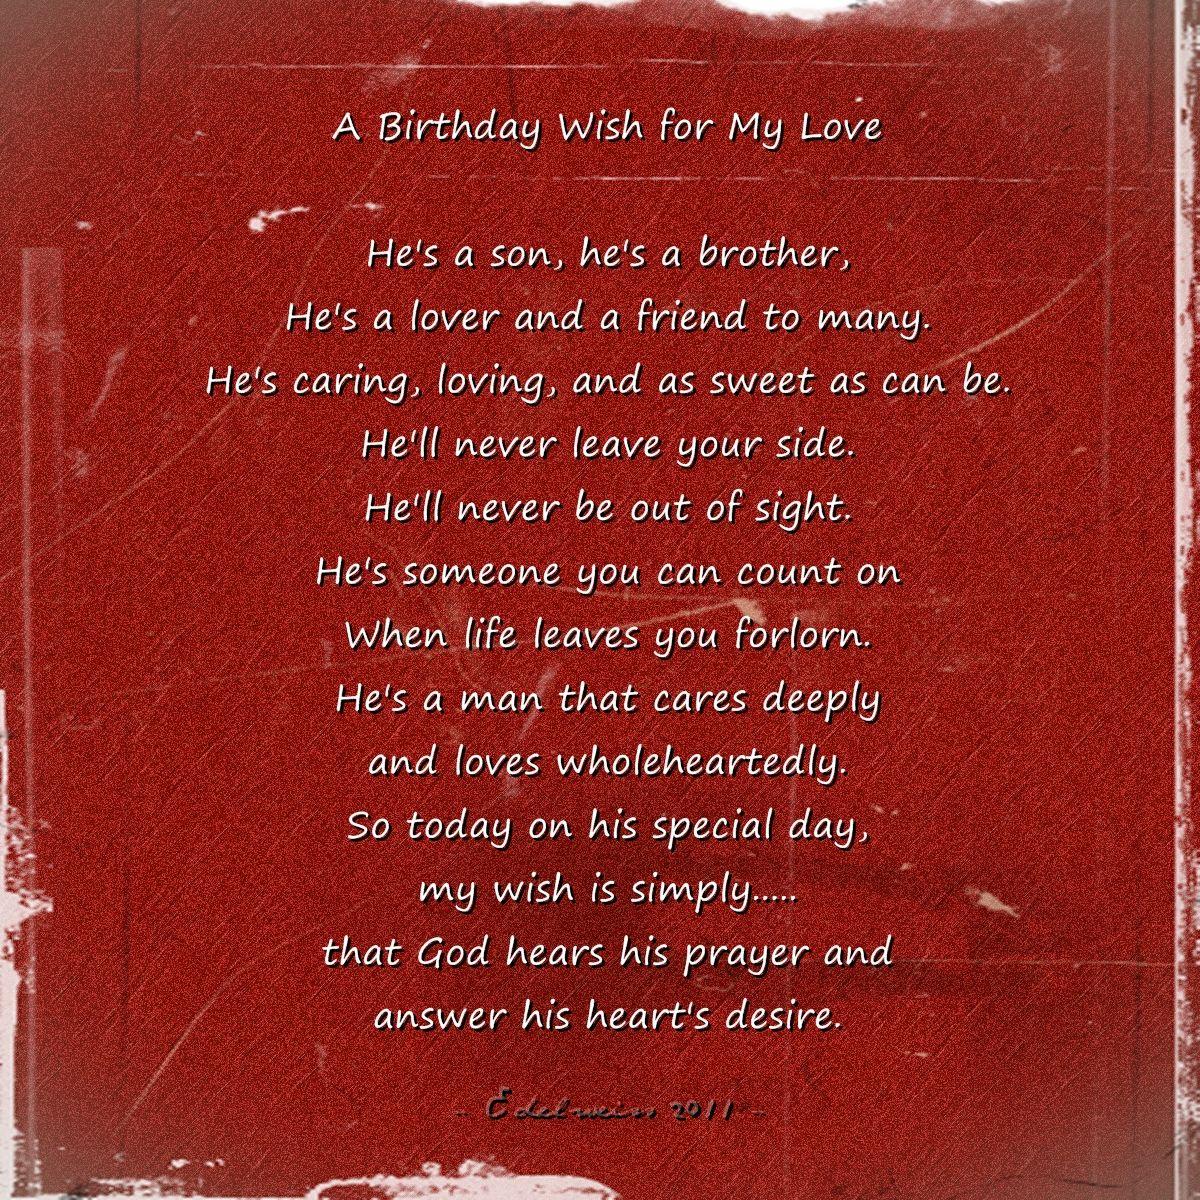 Happy Birthday My Love! ♥